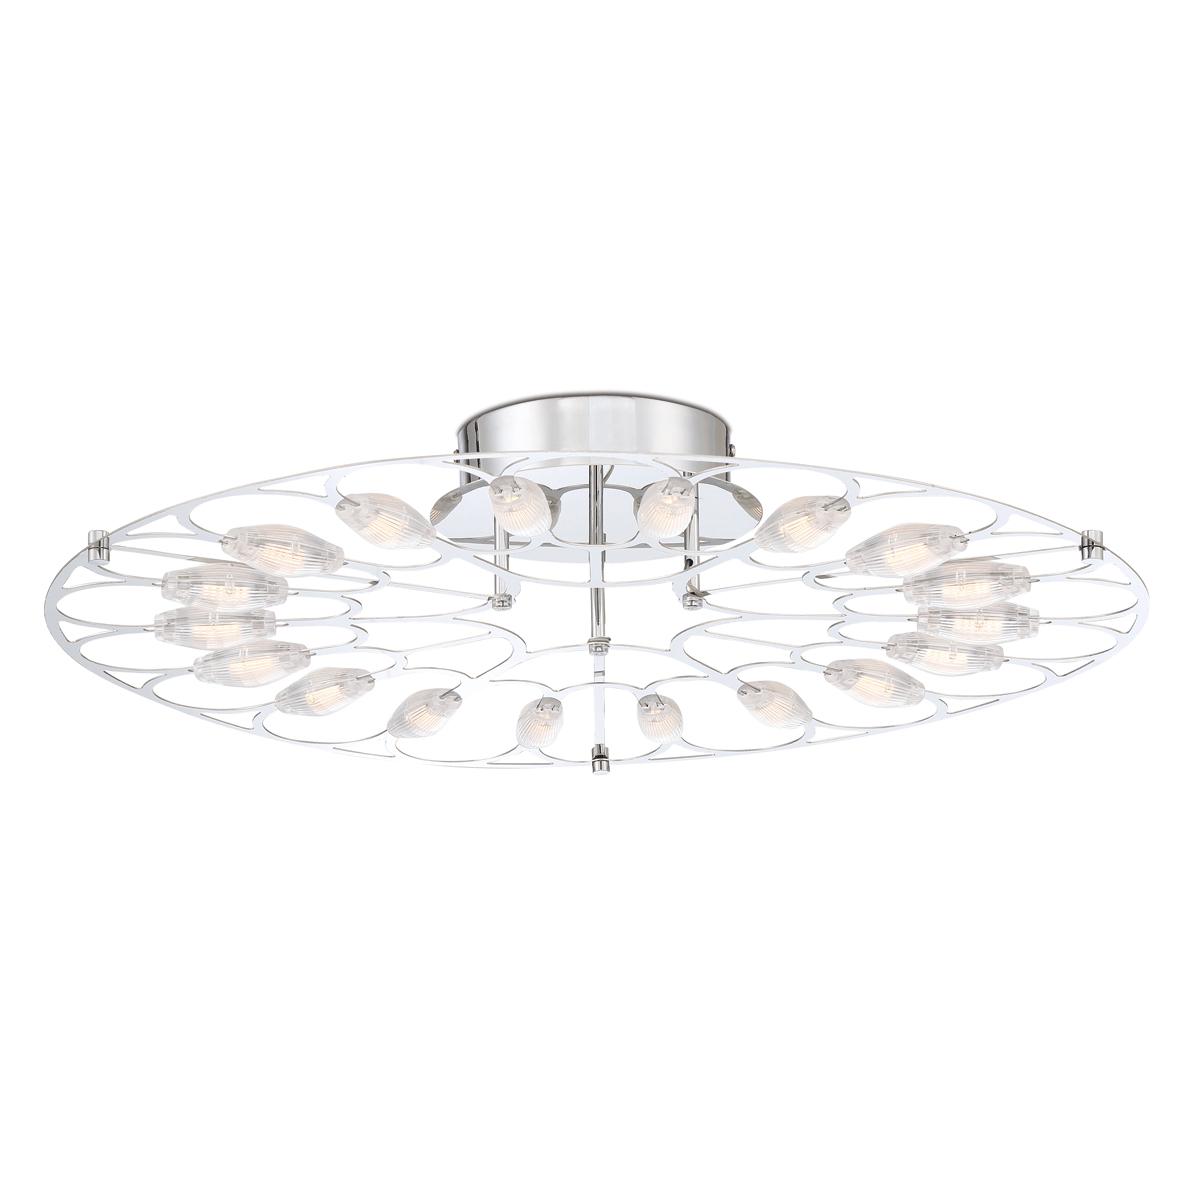 Bathroom Vanity 18 Light Bulb Fixture W Chrome Tone